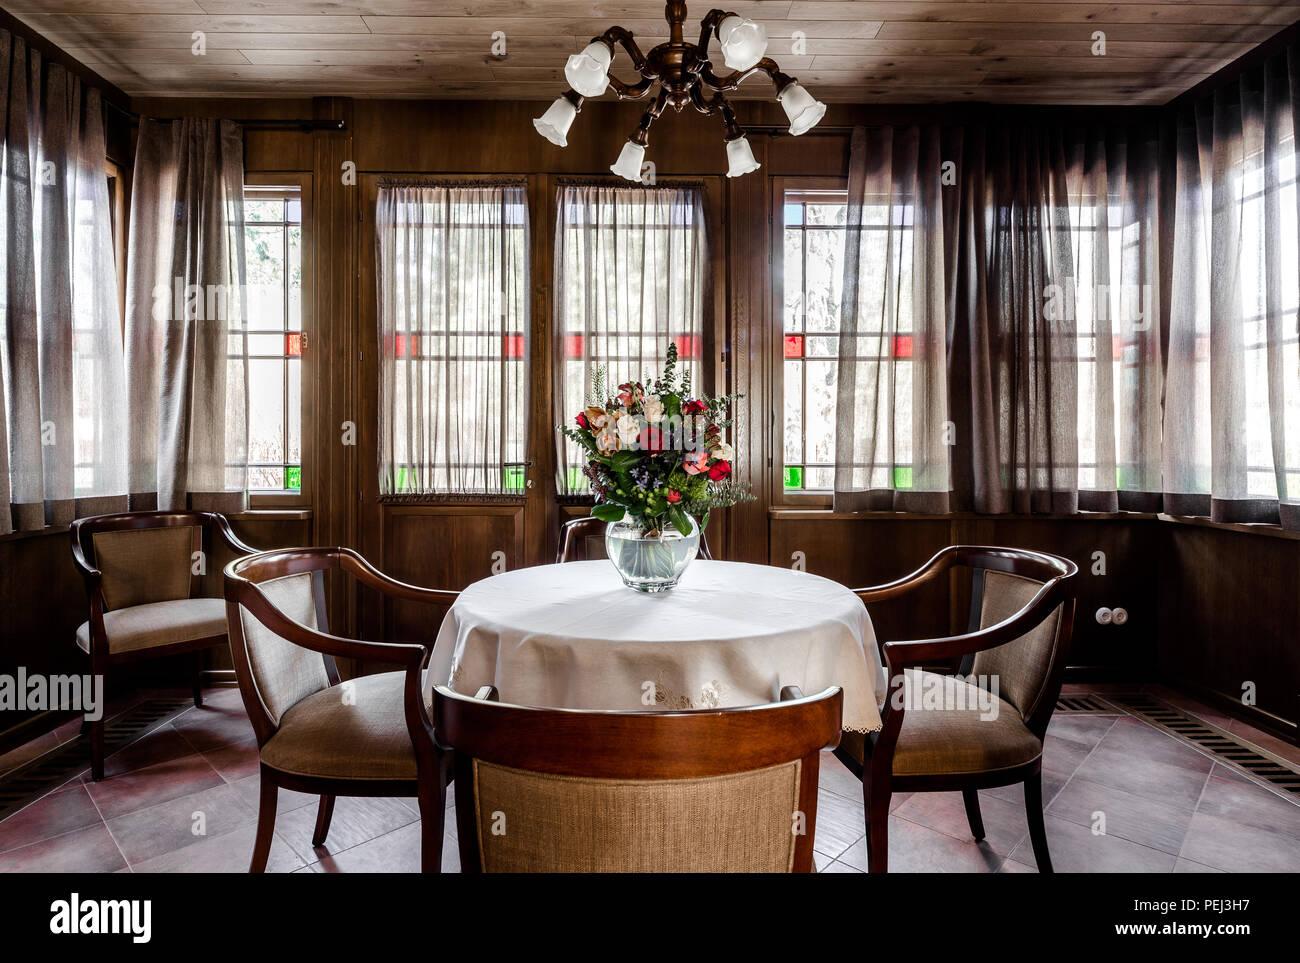 Sala Da Pranzo Contemporanea : Sala da pranzo contemporanea prezzi furniture uk shop tavolo da